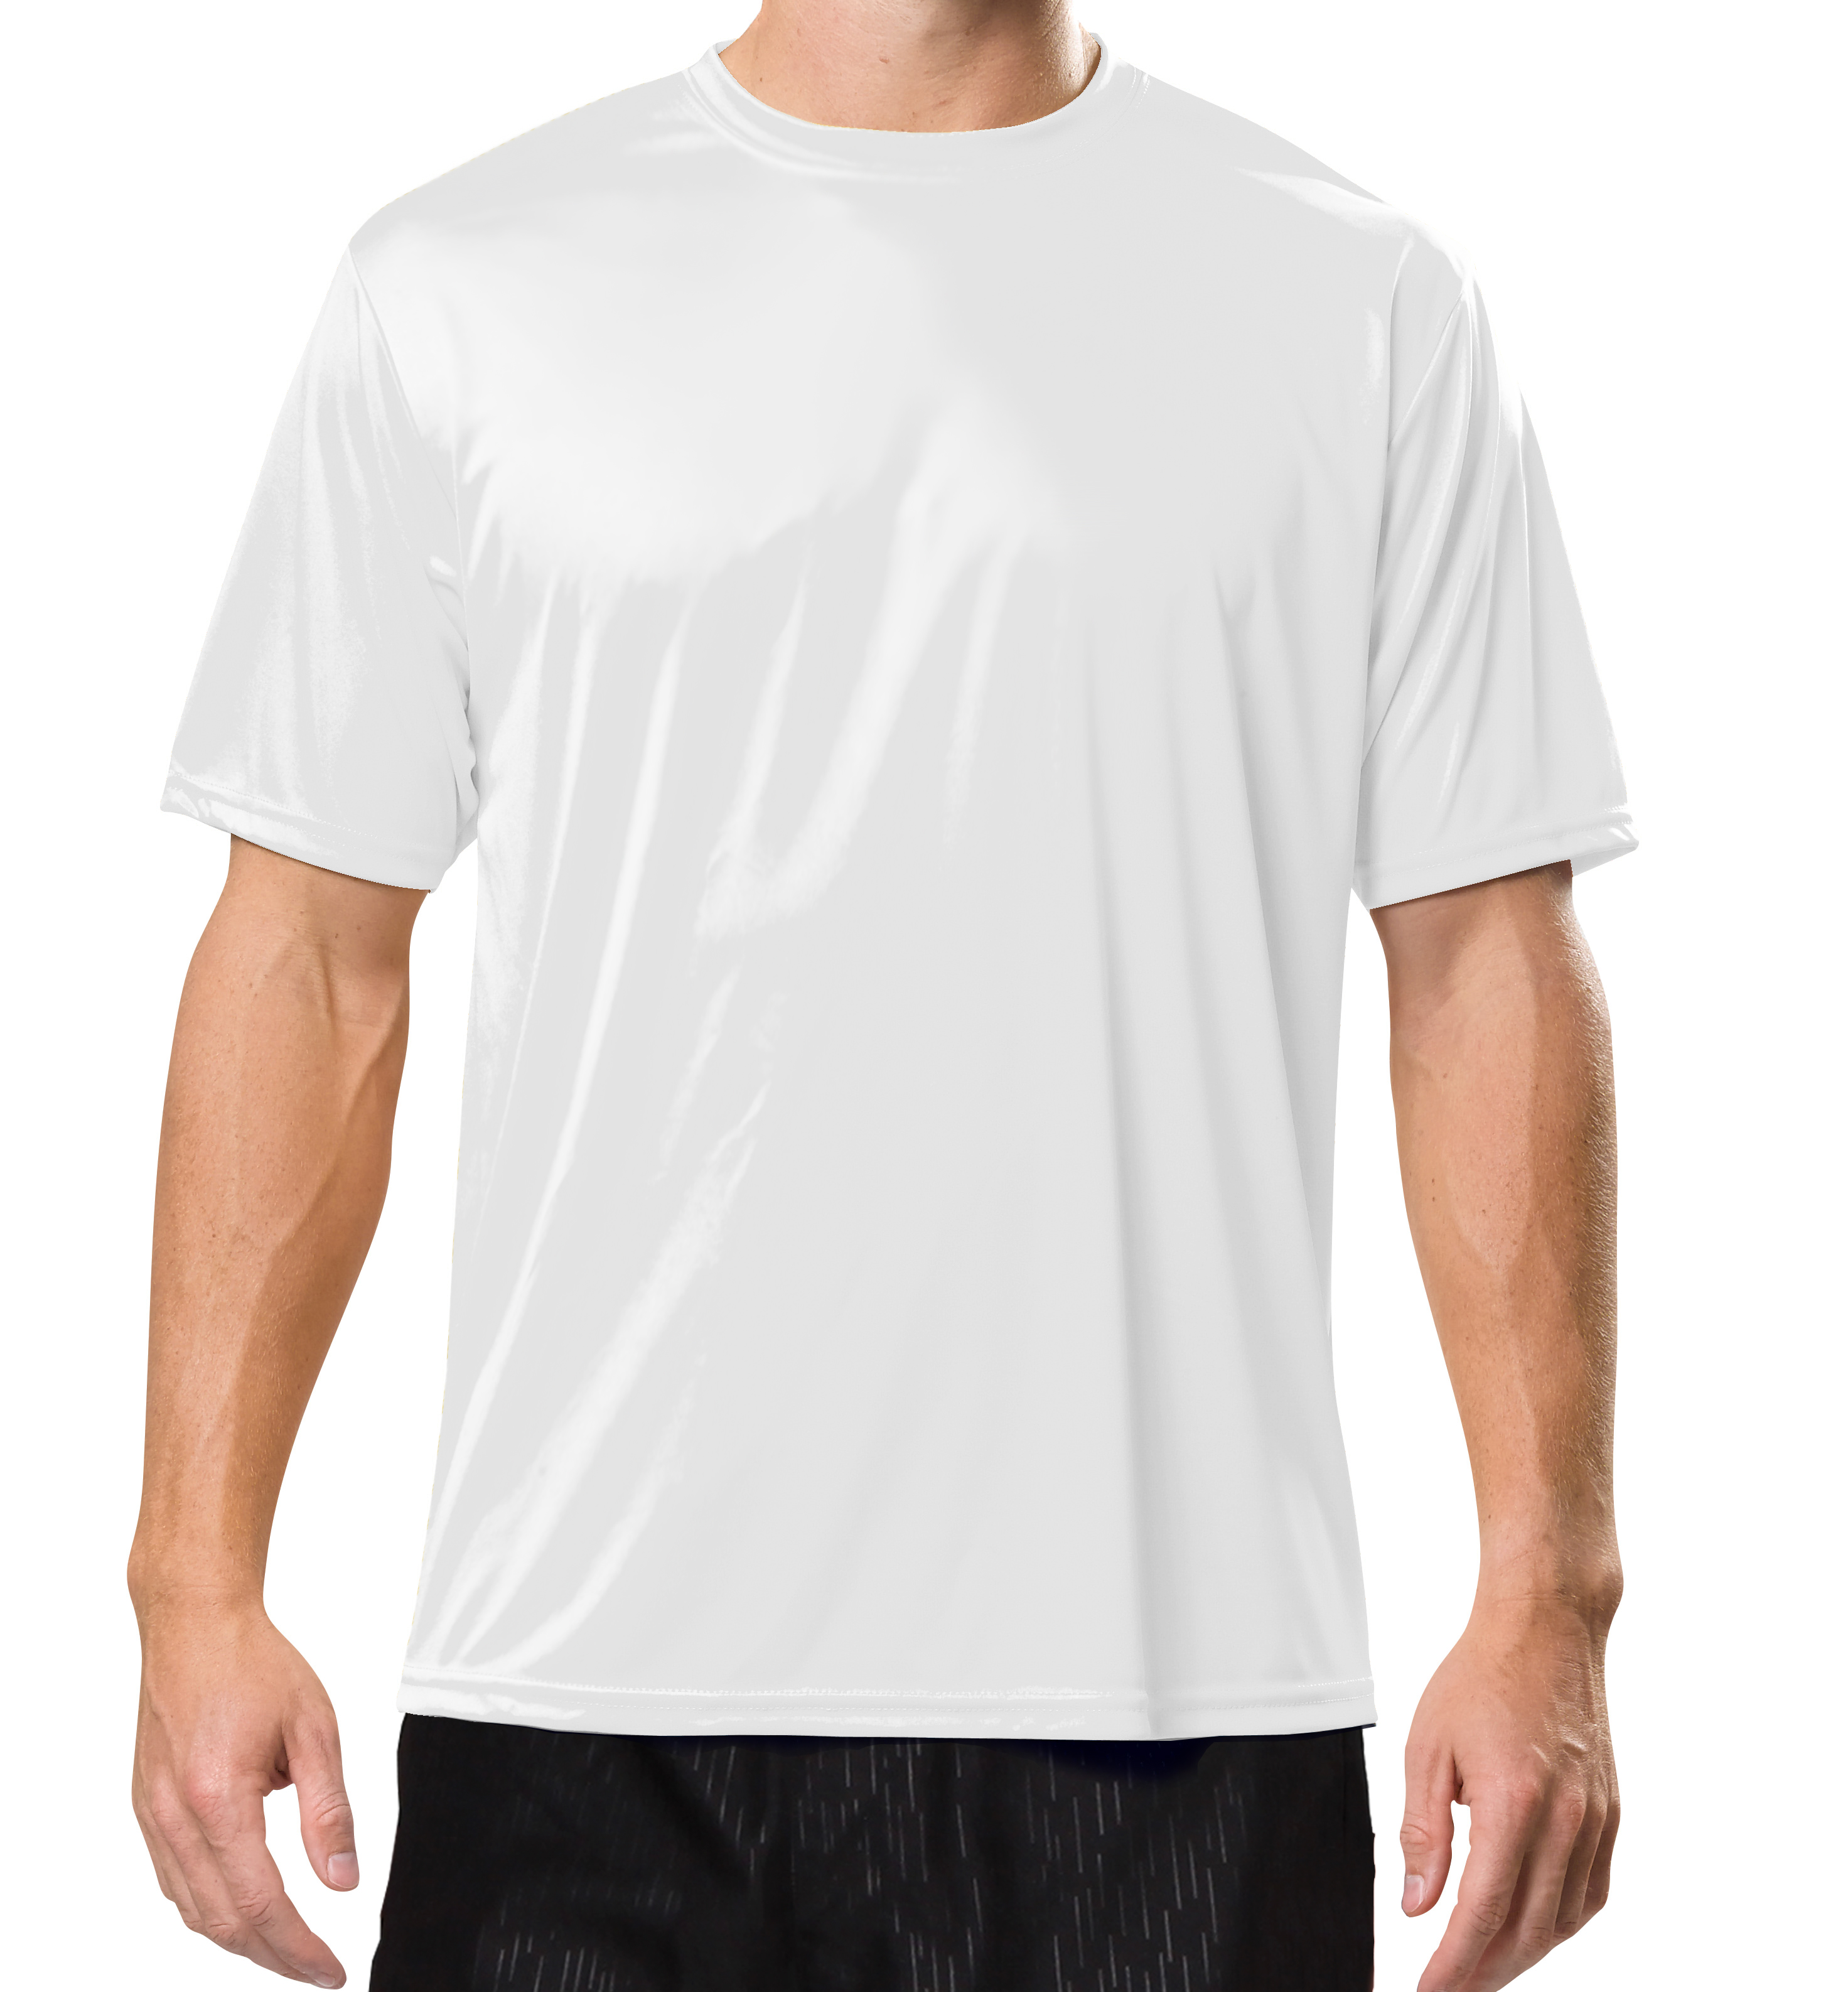 Mens-Rash-Guard-Surf-Swimwear-Swim-Shirt-SPF-Sun-Protection-Loose-Fit-Fitting thumbnail 69